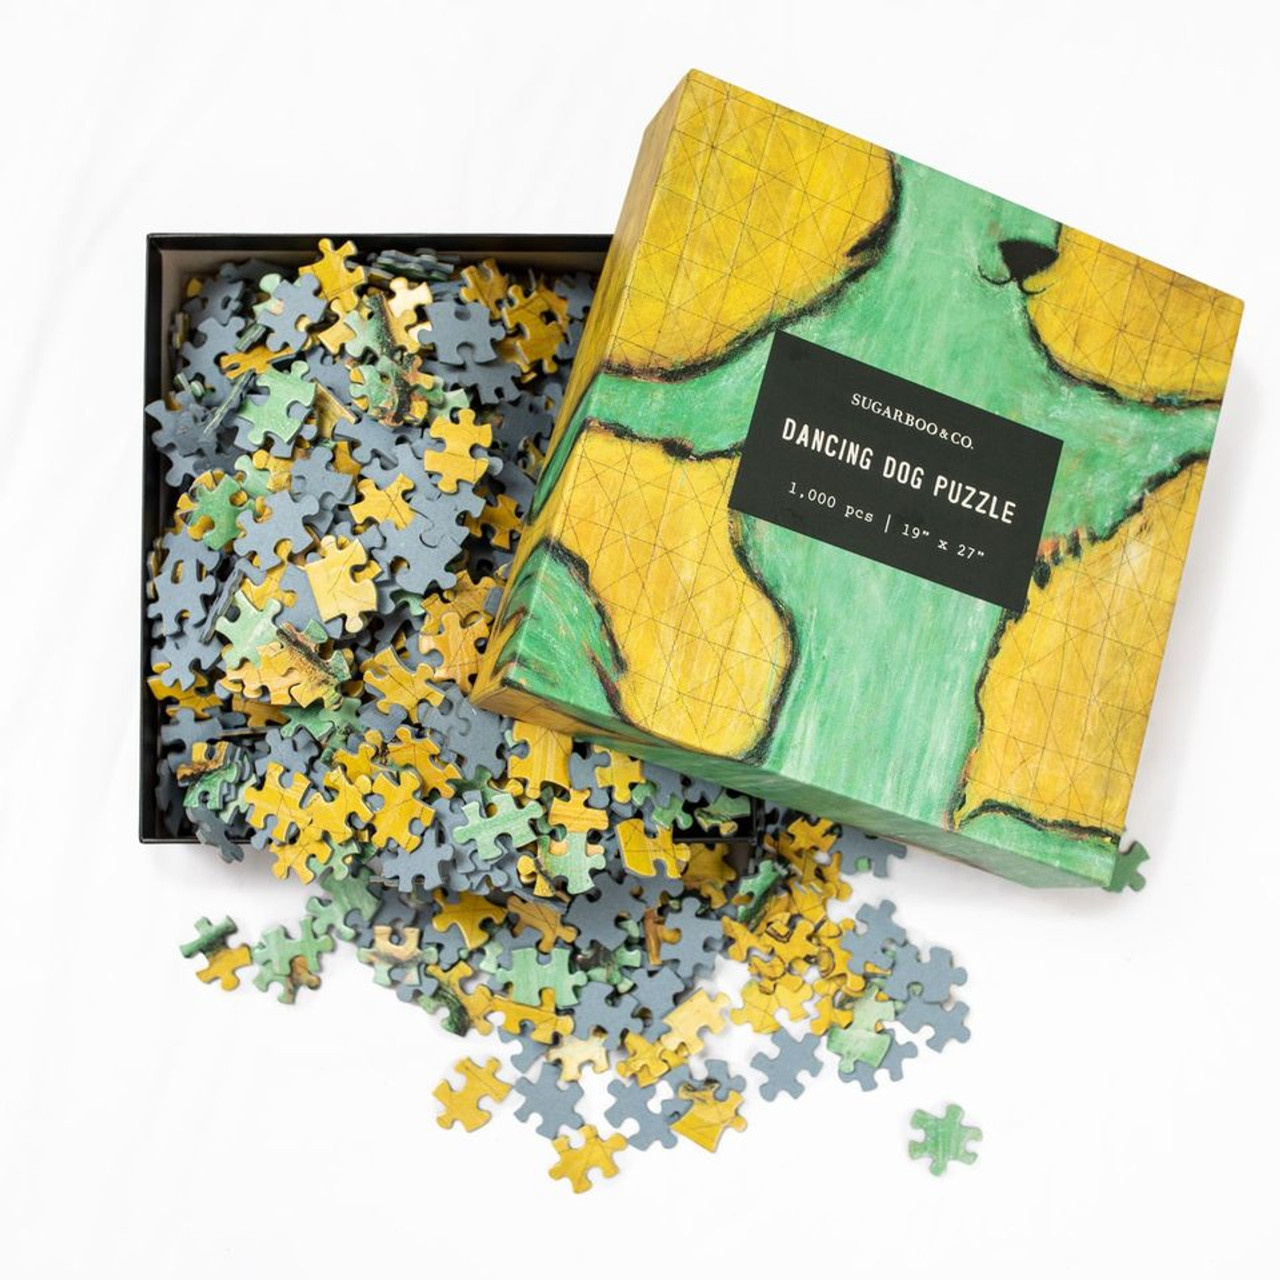 Dancing Dog Puzzle (1,000pcs)